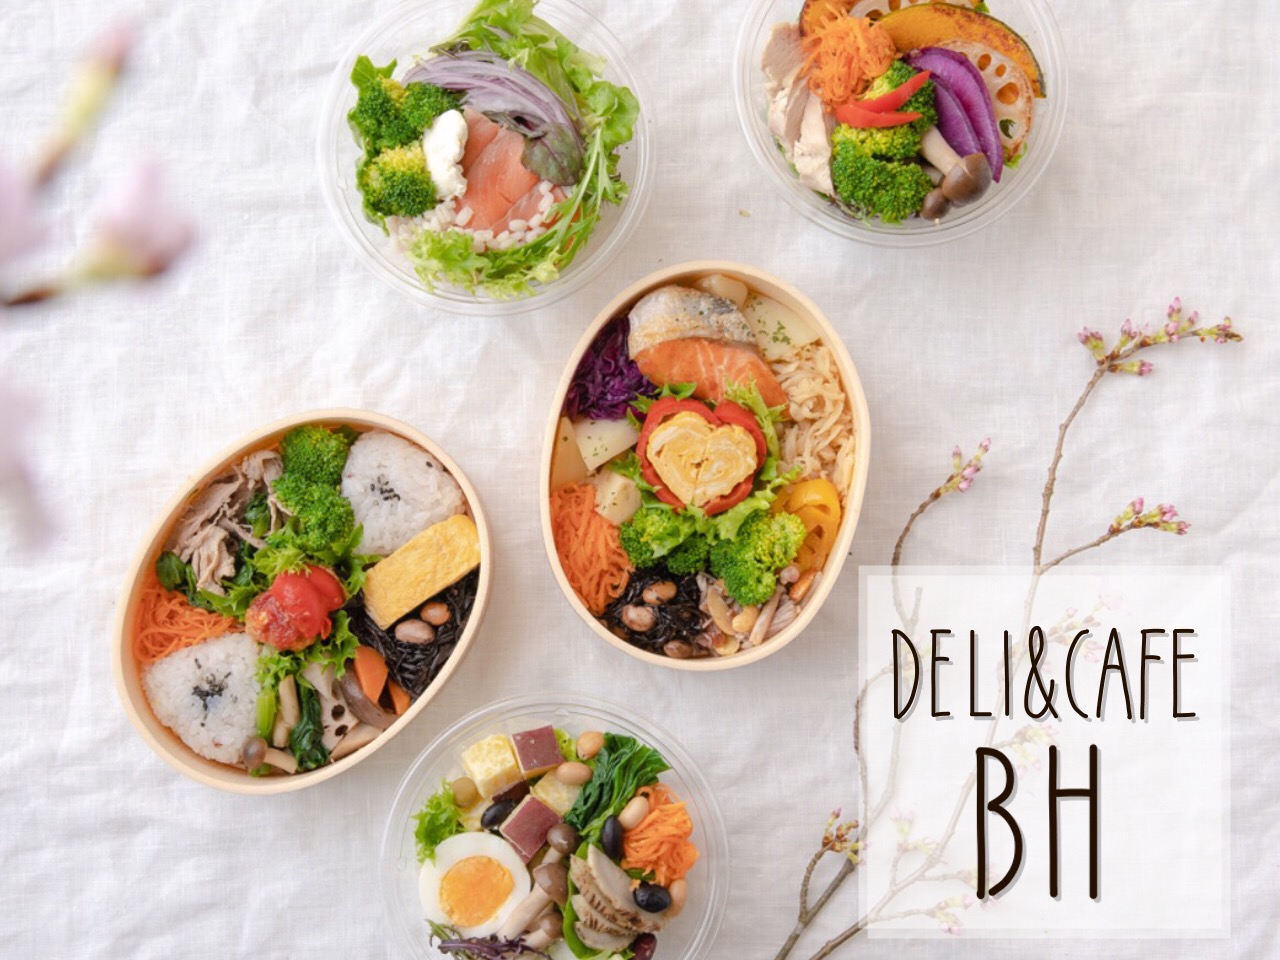 DELI&CAFE BH